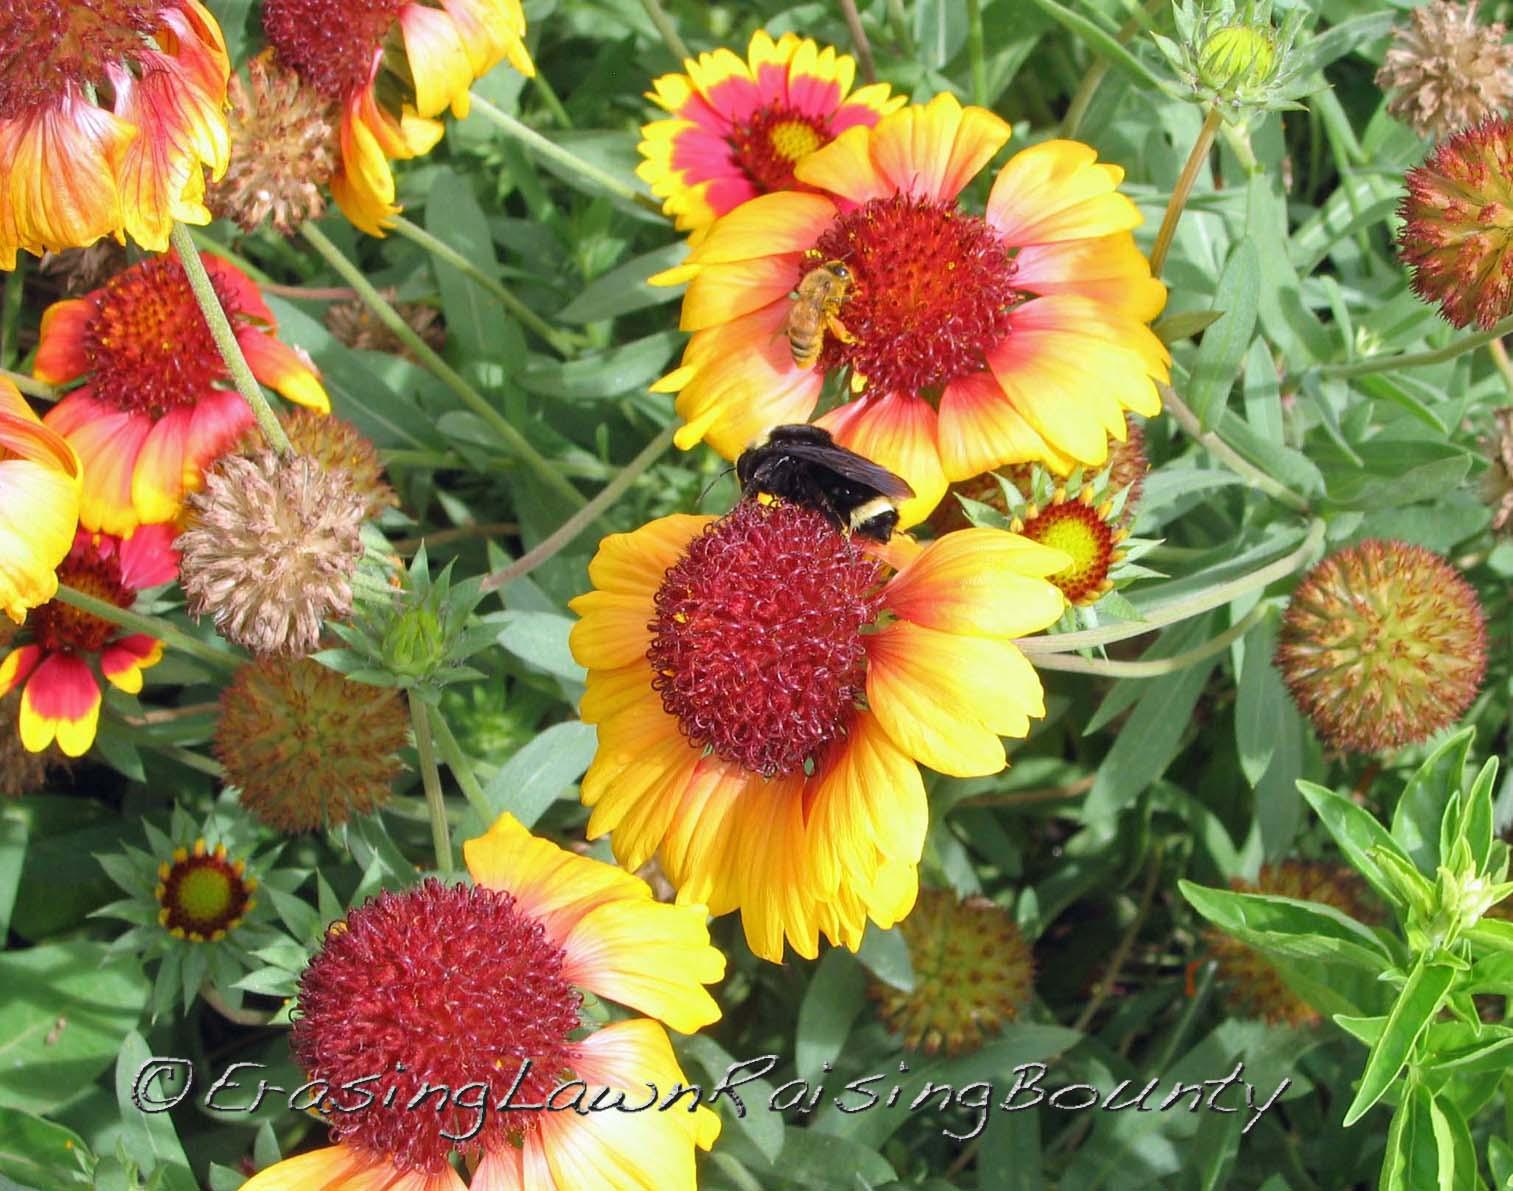 Bumblebee and honey bee on gaillaria flowers